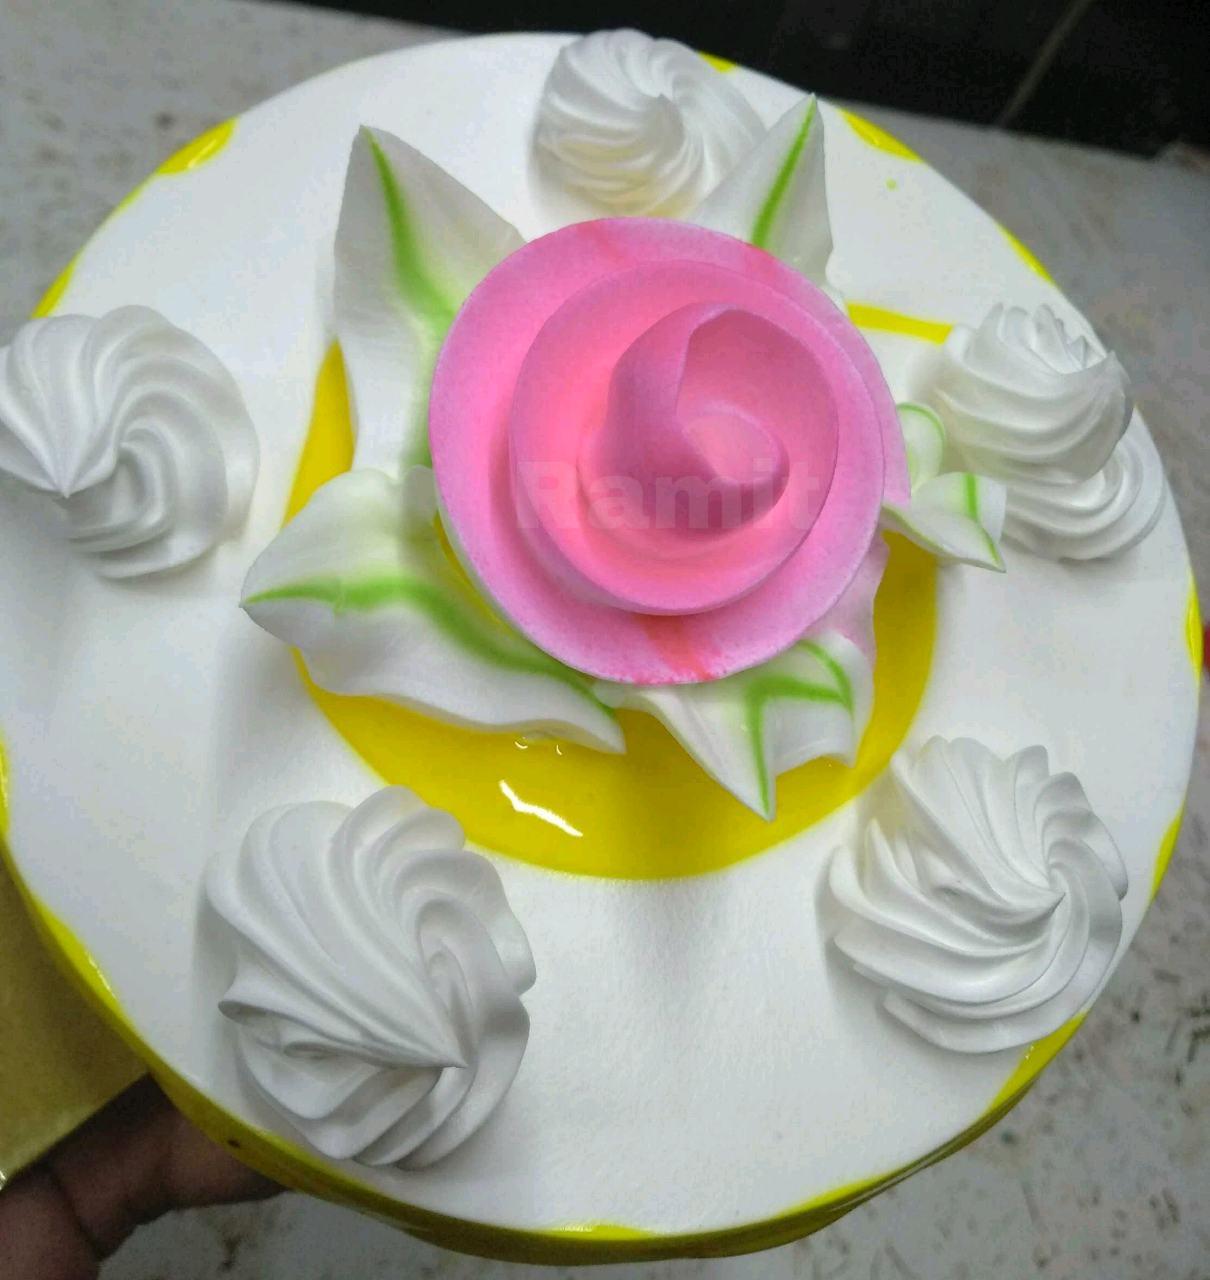 Vanilla Sponge Frosting Cake